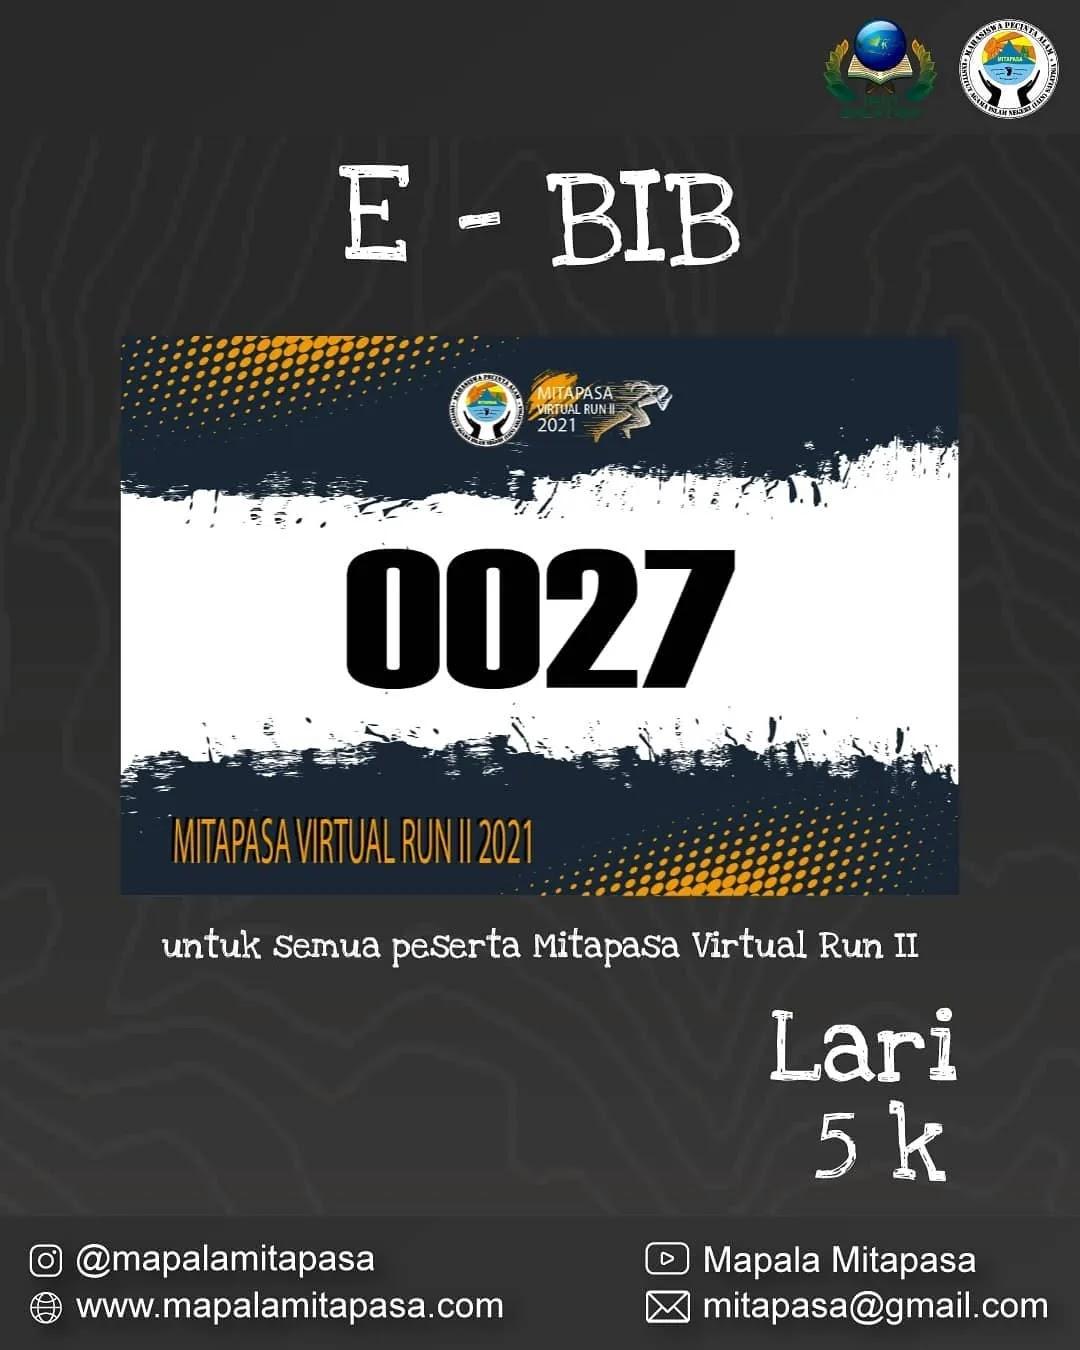 e-Bib 💳 Mitapasa Virtual Run II • 2021